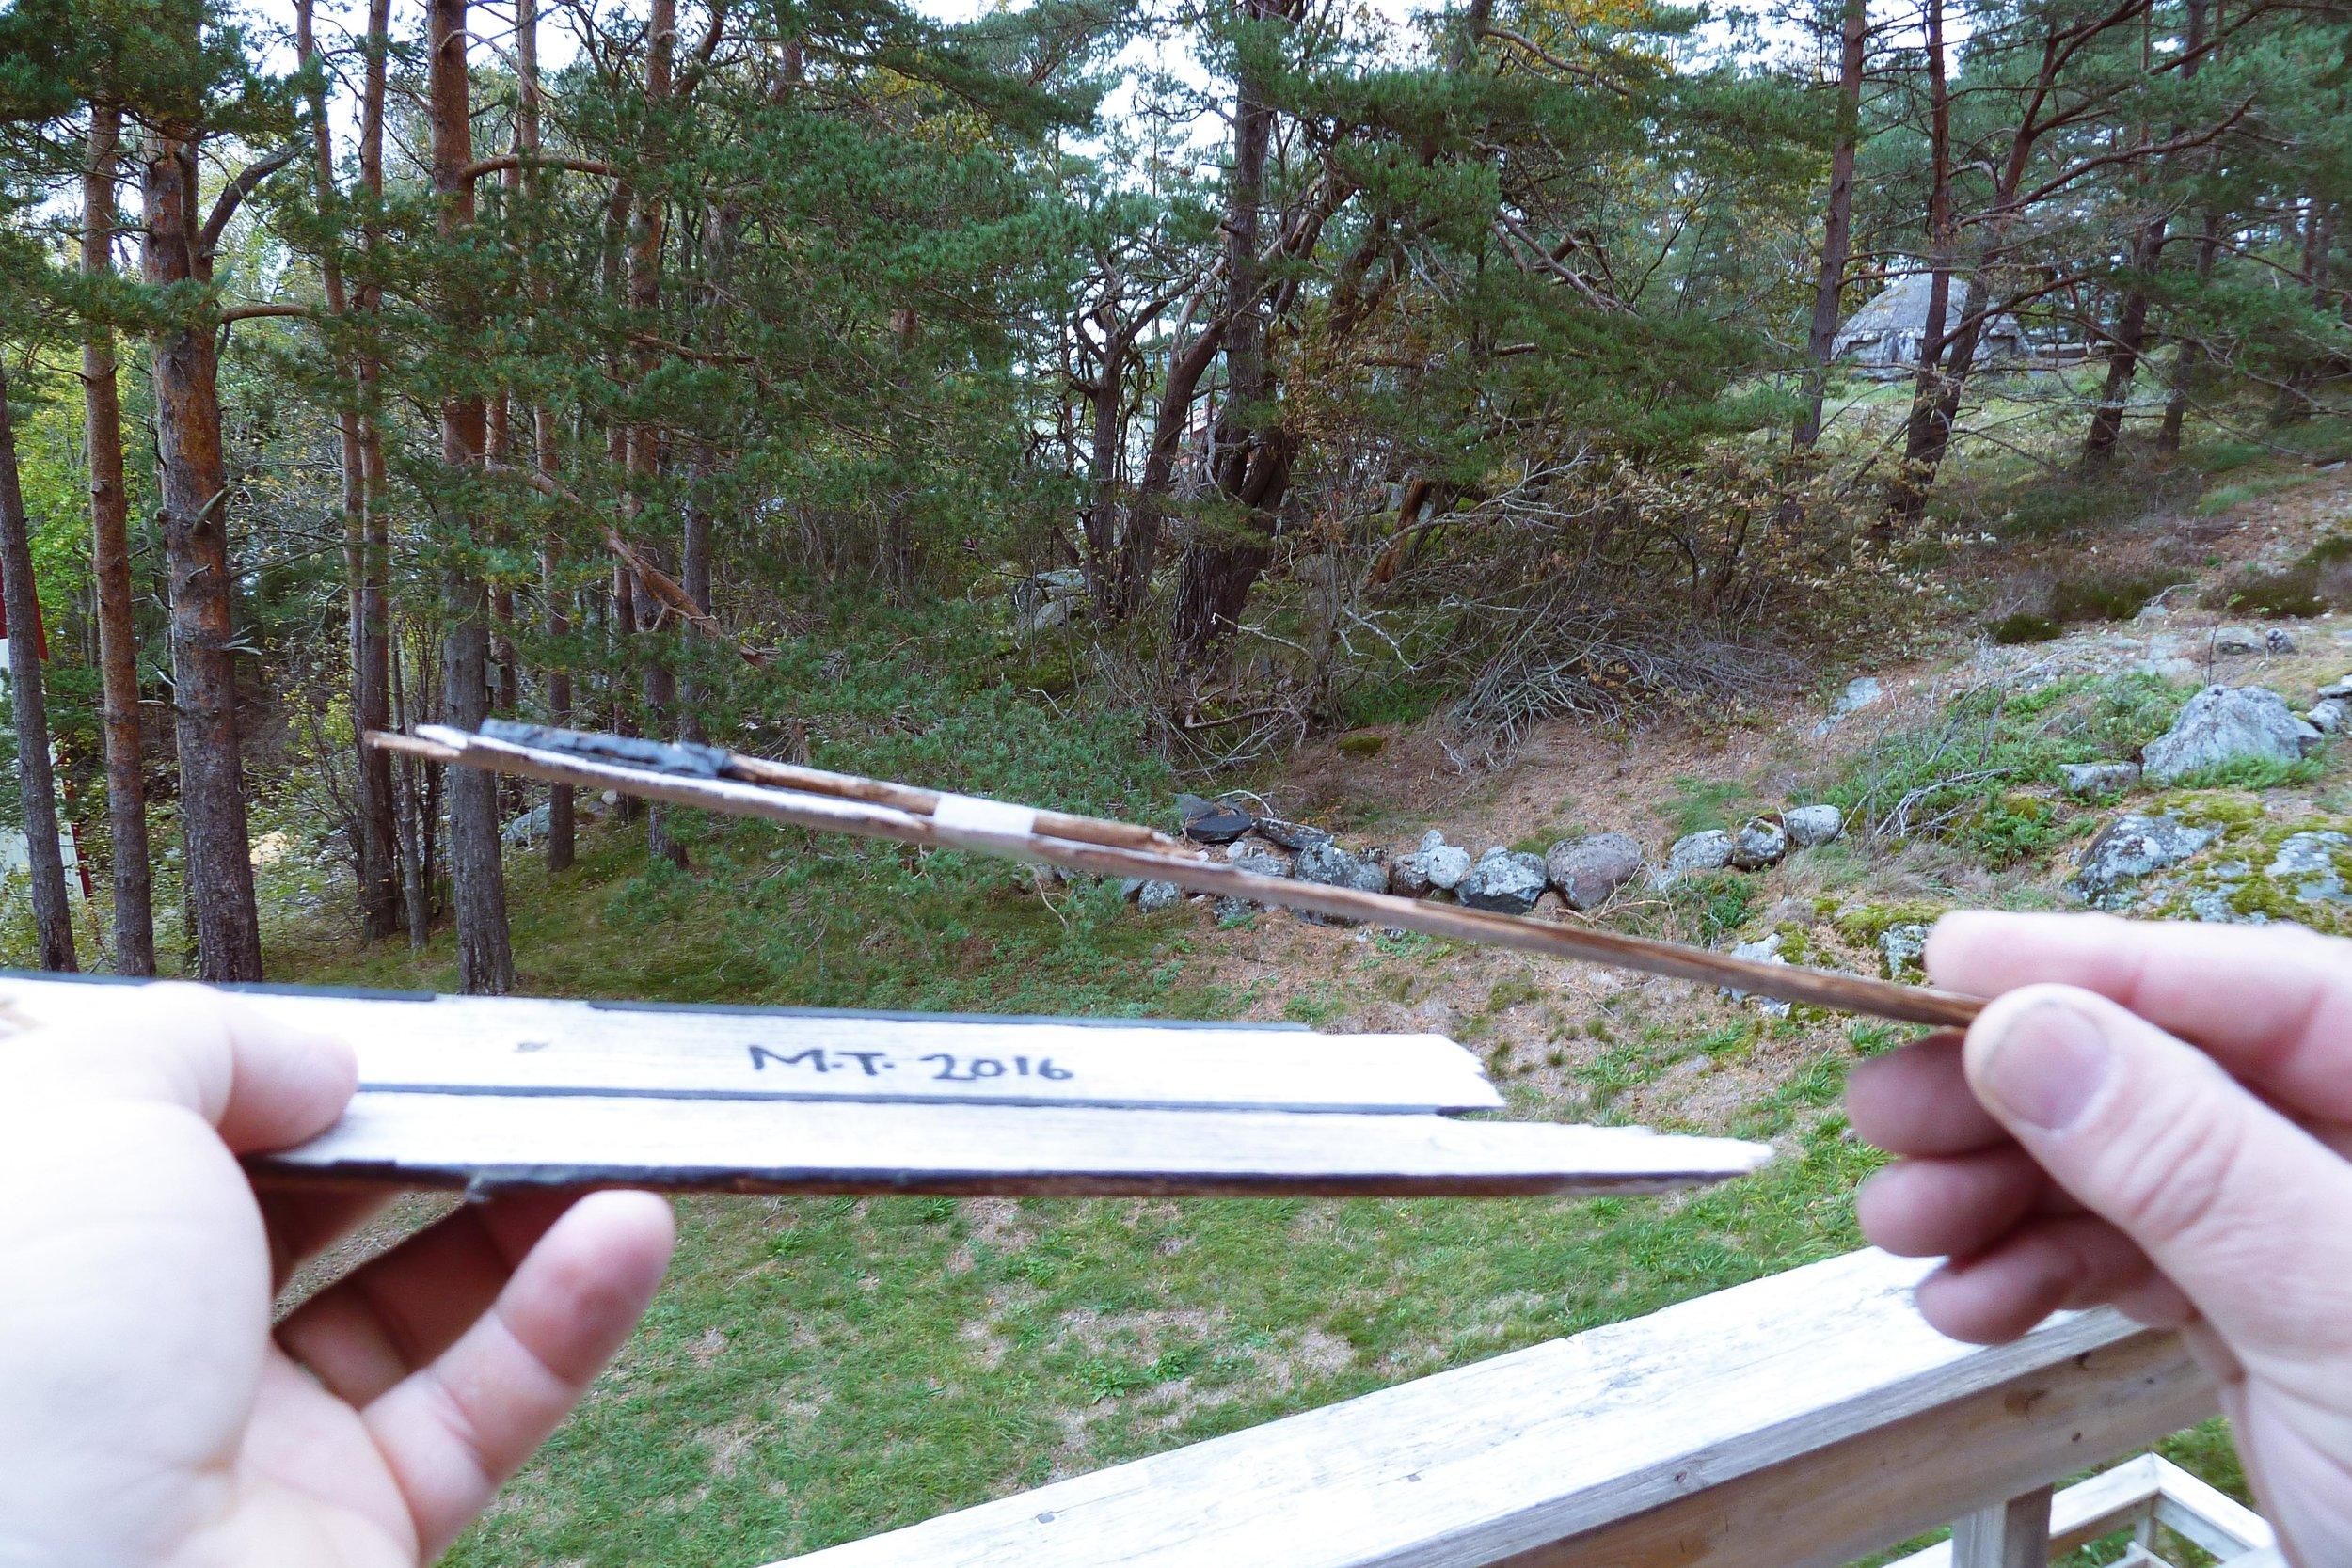 Bits of the teak deck on Mahina Tiare 111. Probably the longest milage on a Hallberg Rassy teak deck ever. Photo by: Daniel Novello